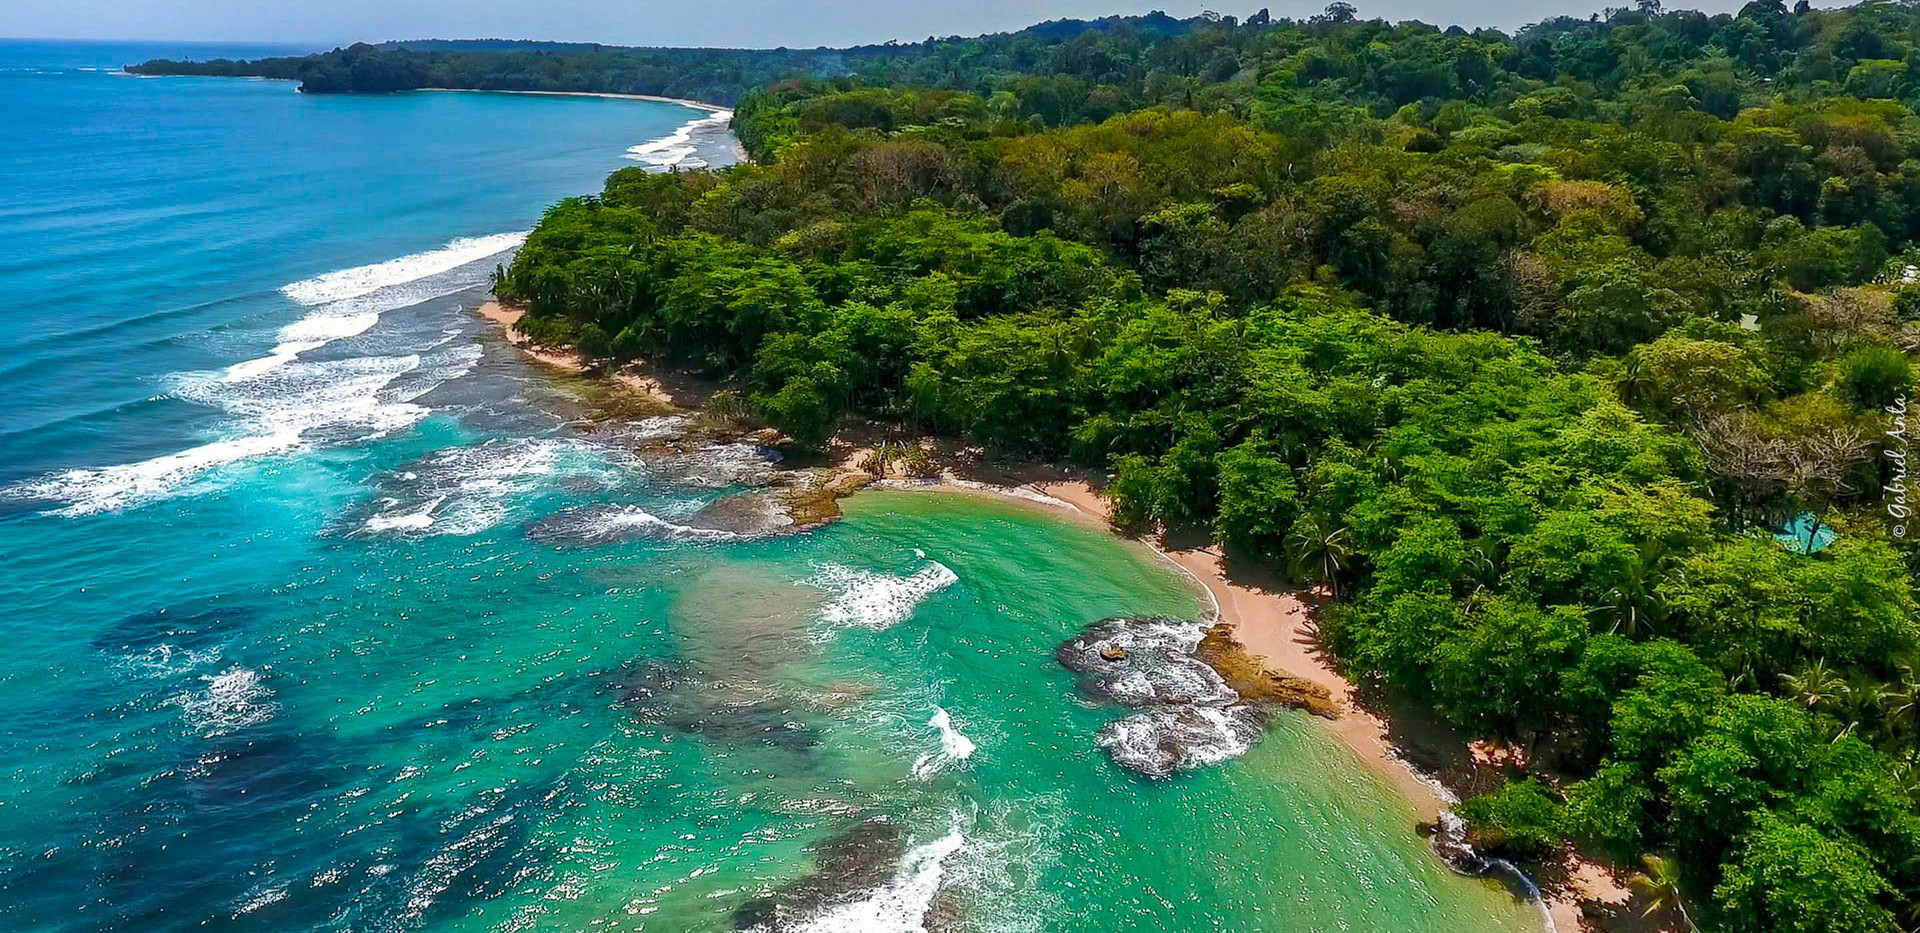 Playa-Chiquita-foto-Gabriel-Anta-7.jpg